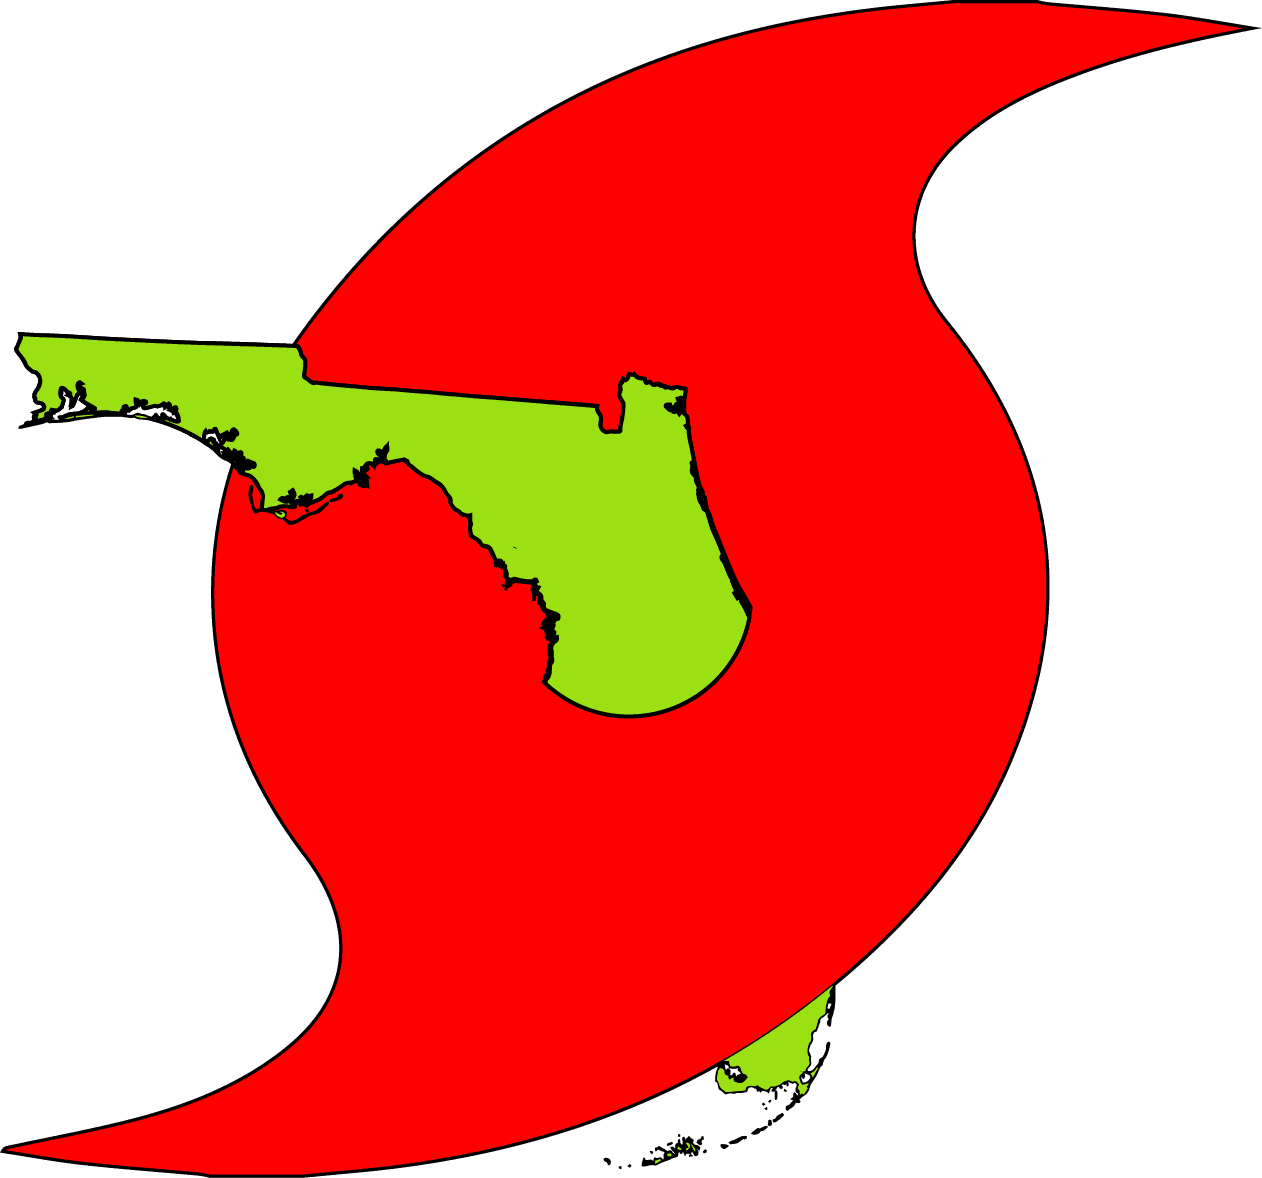 Hurricane clipart hurricane damage.  awareness symbol with